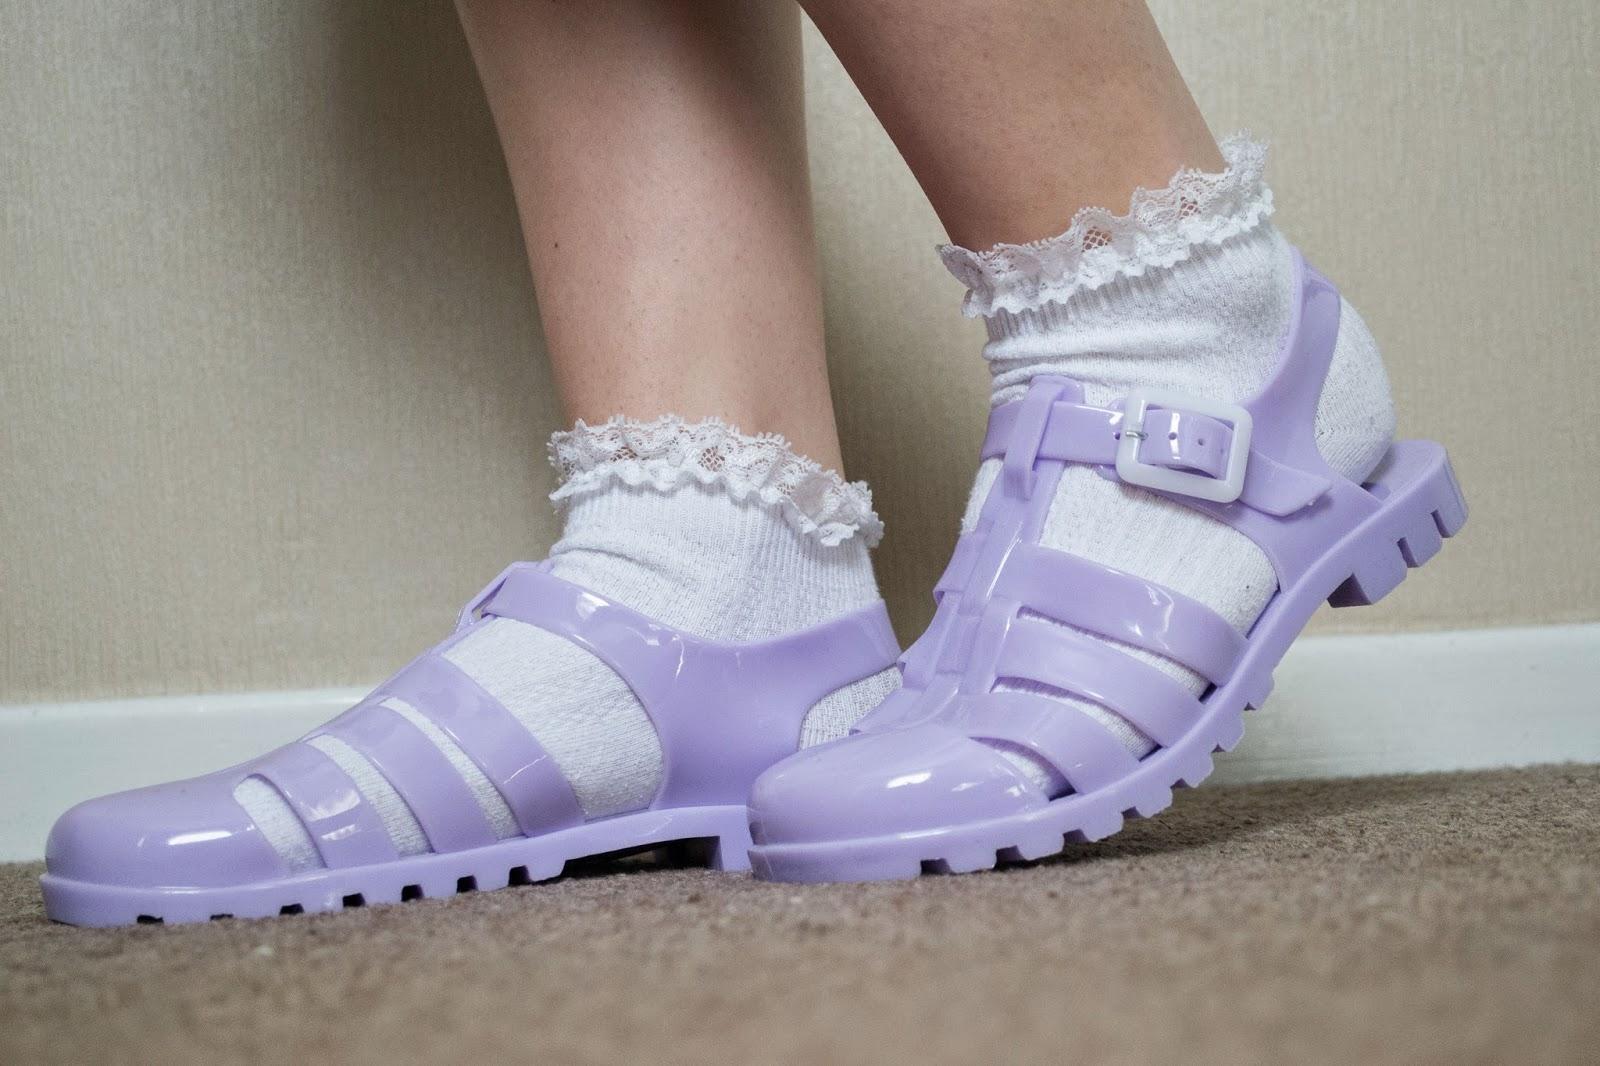 Black Jelly Shoes Primark